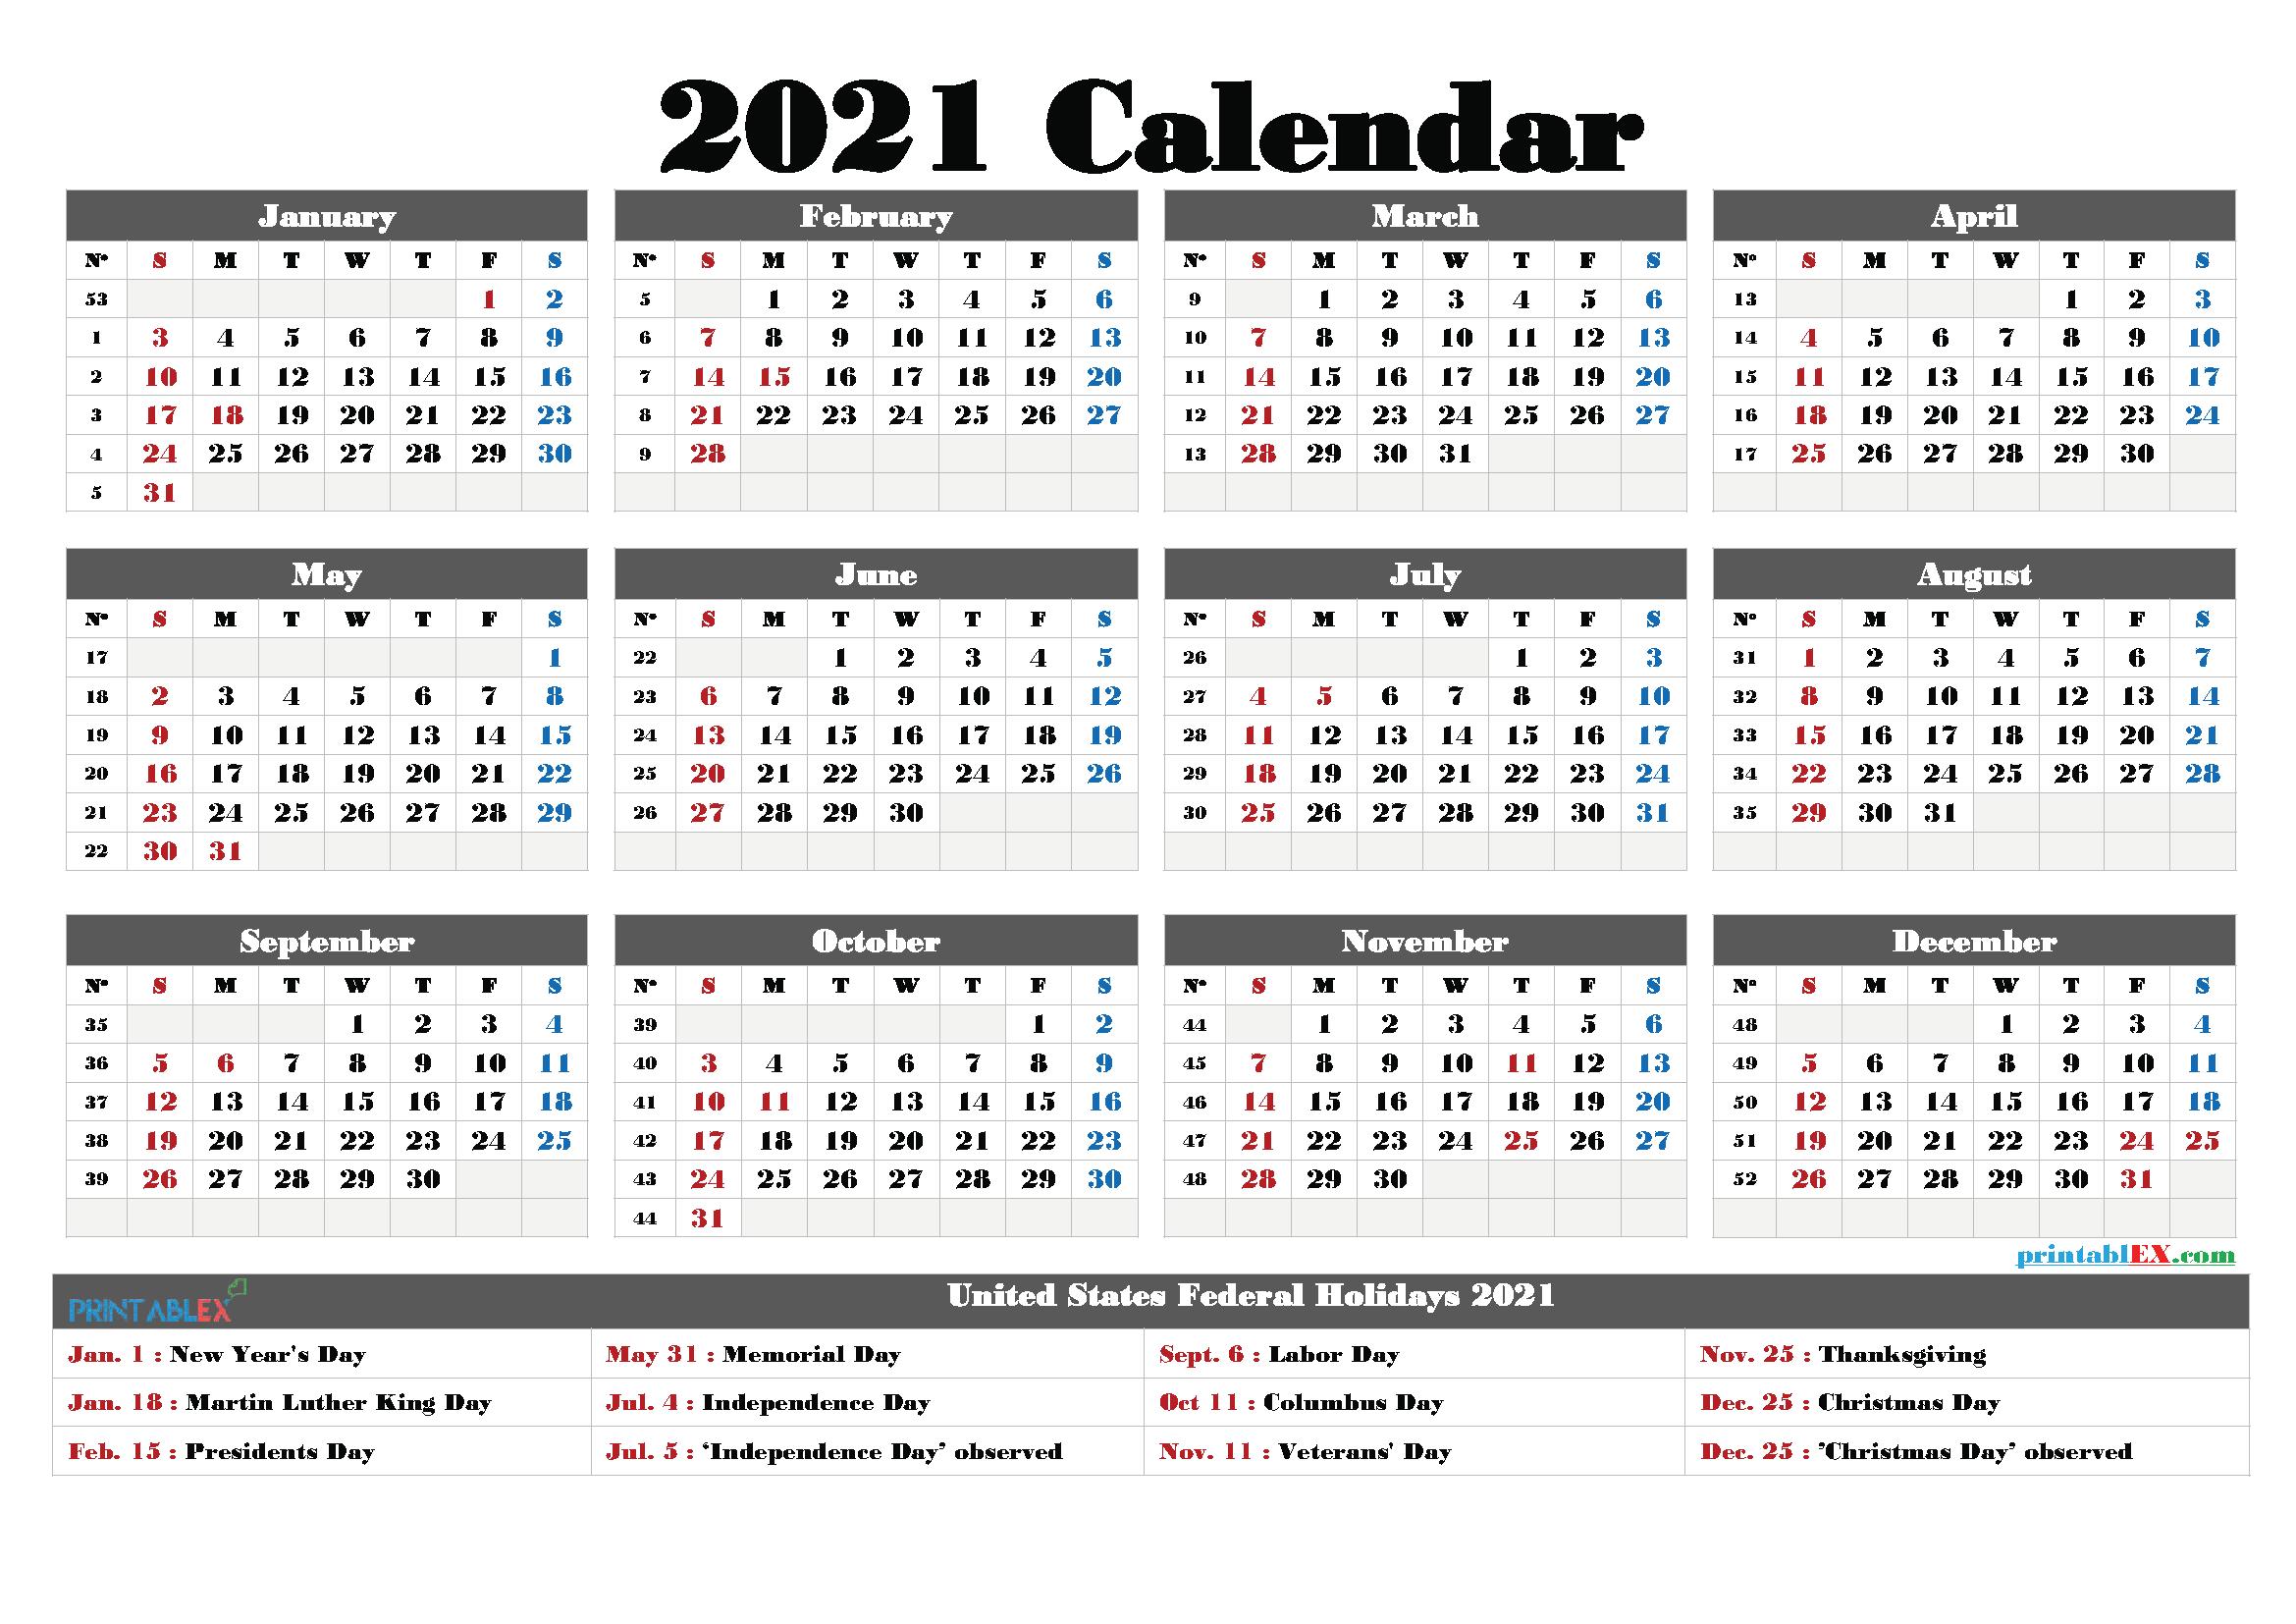 Printable 2021 Calendar With Holidays regarding Federal Government Calendar 2021 Printable